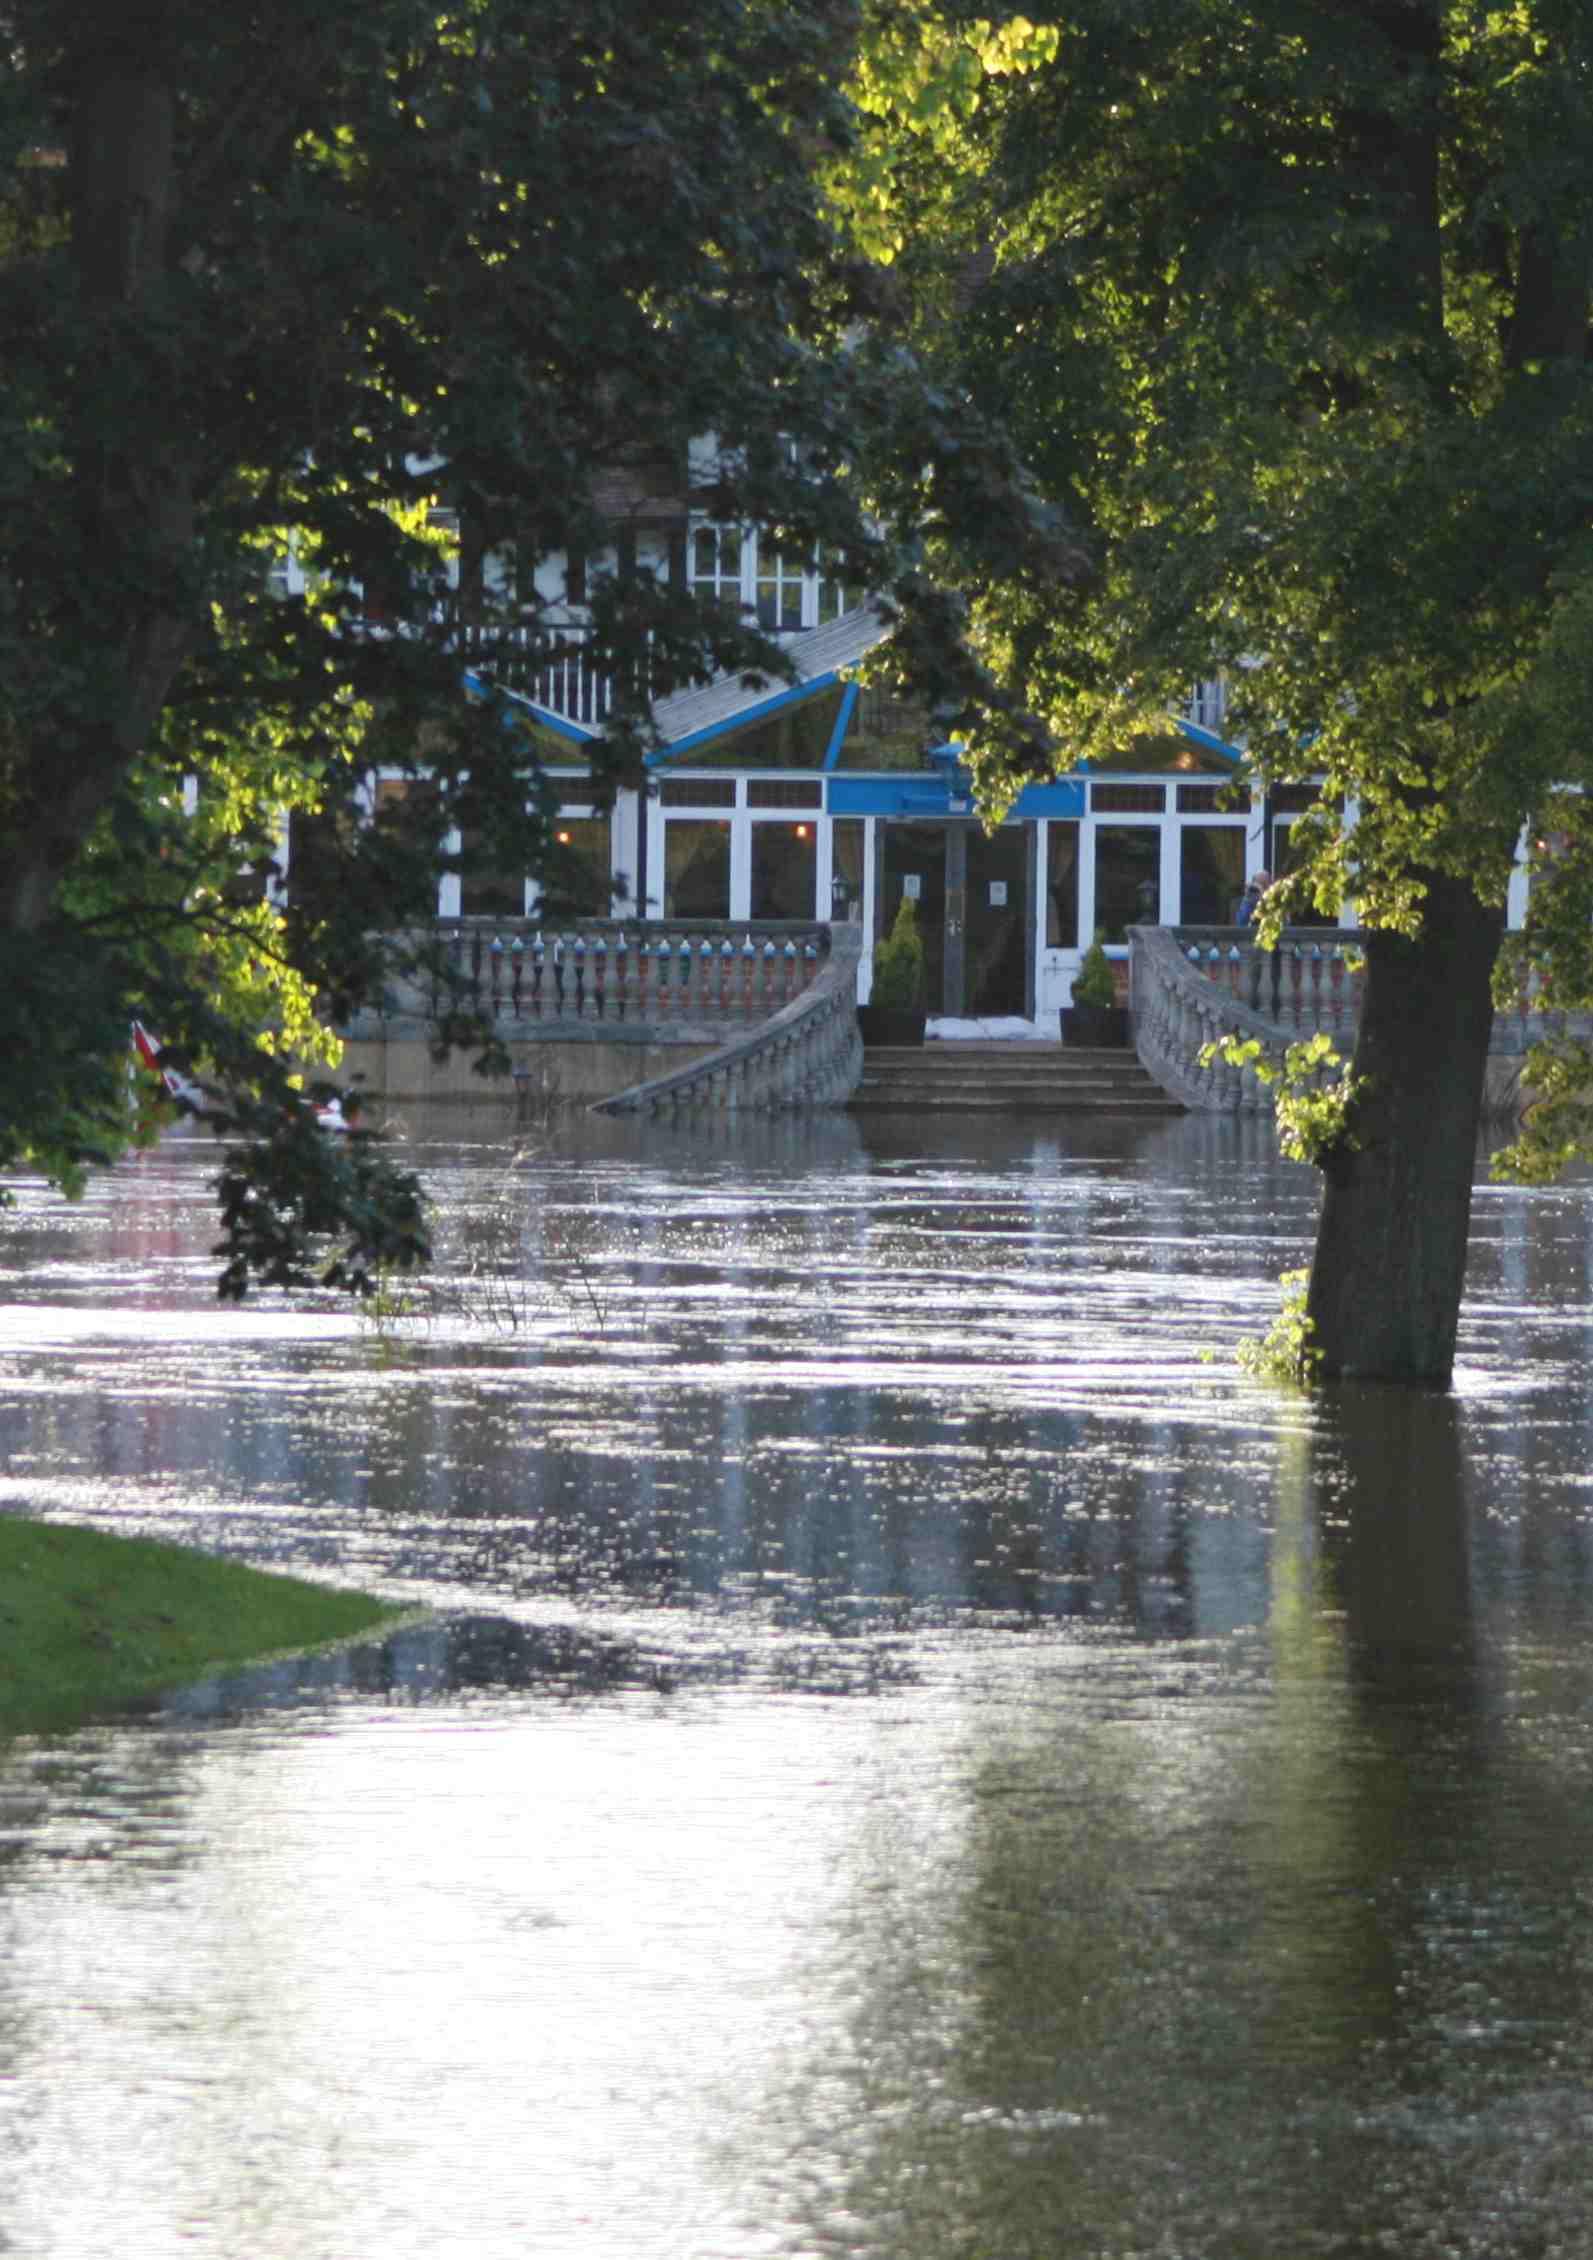 Flooding in Wallingford